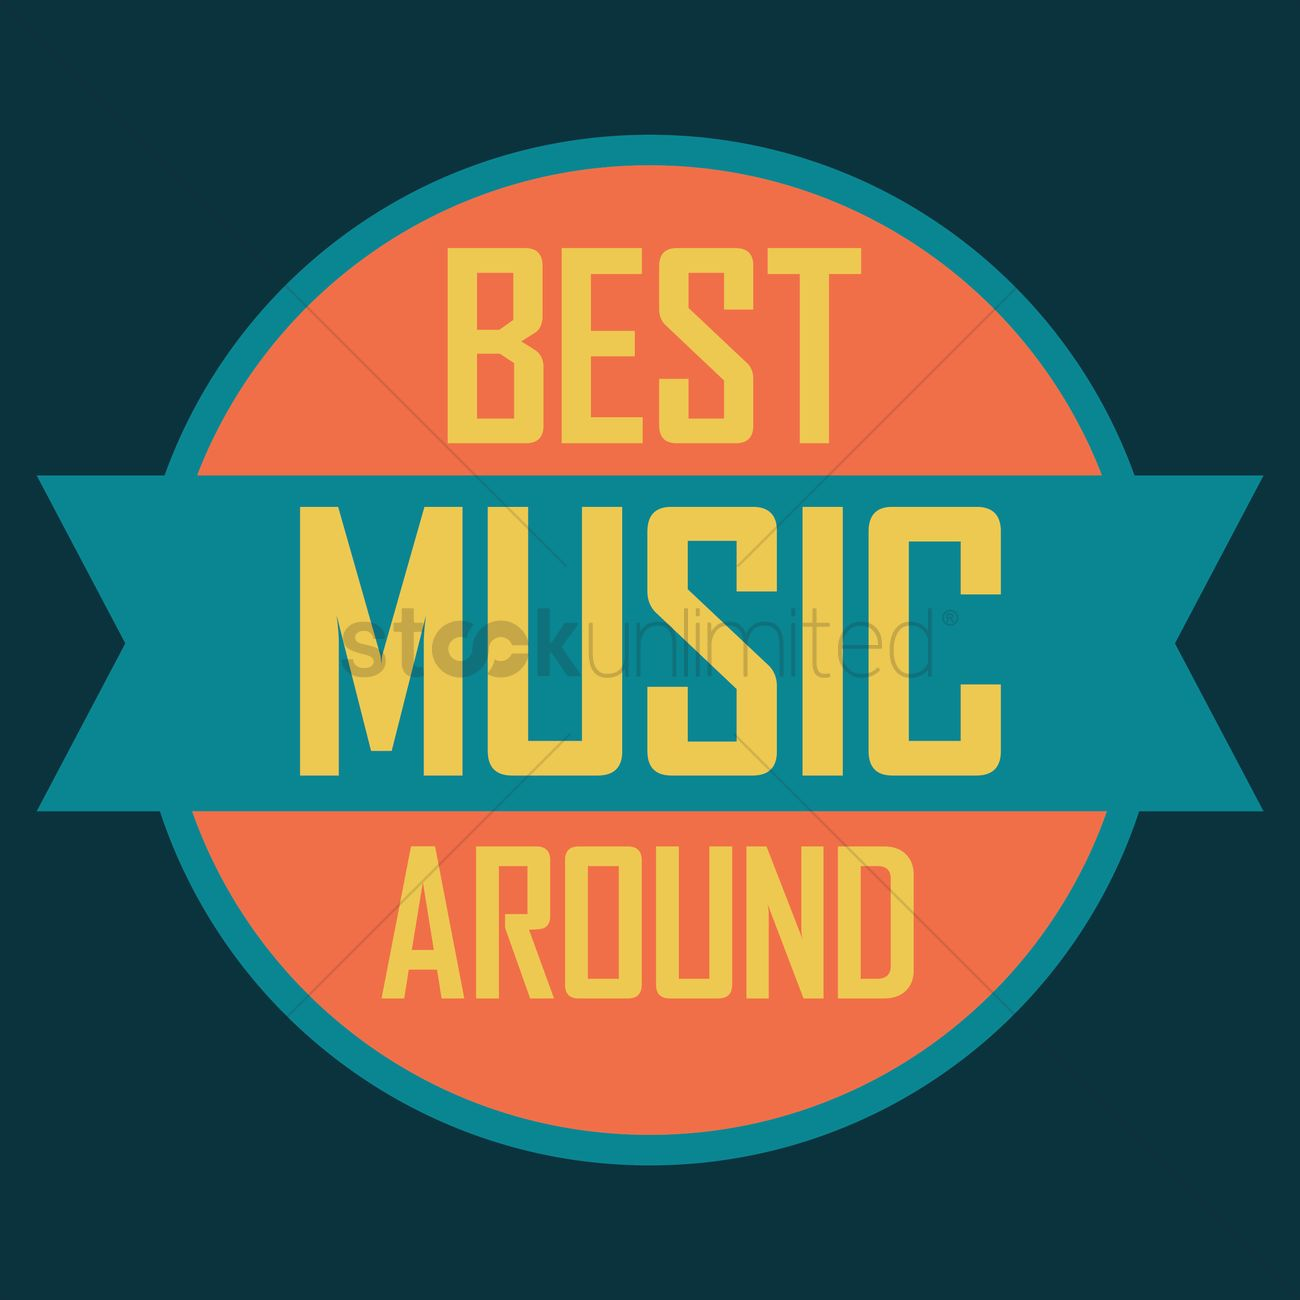 Best Music Label Design Vector Image